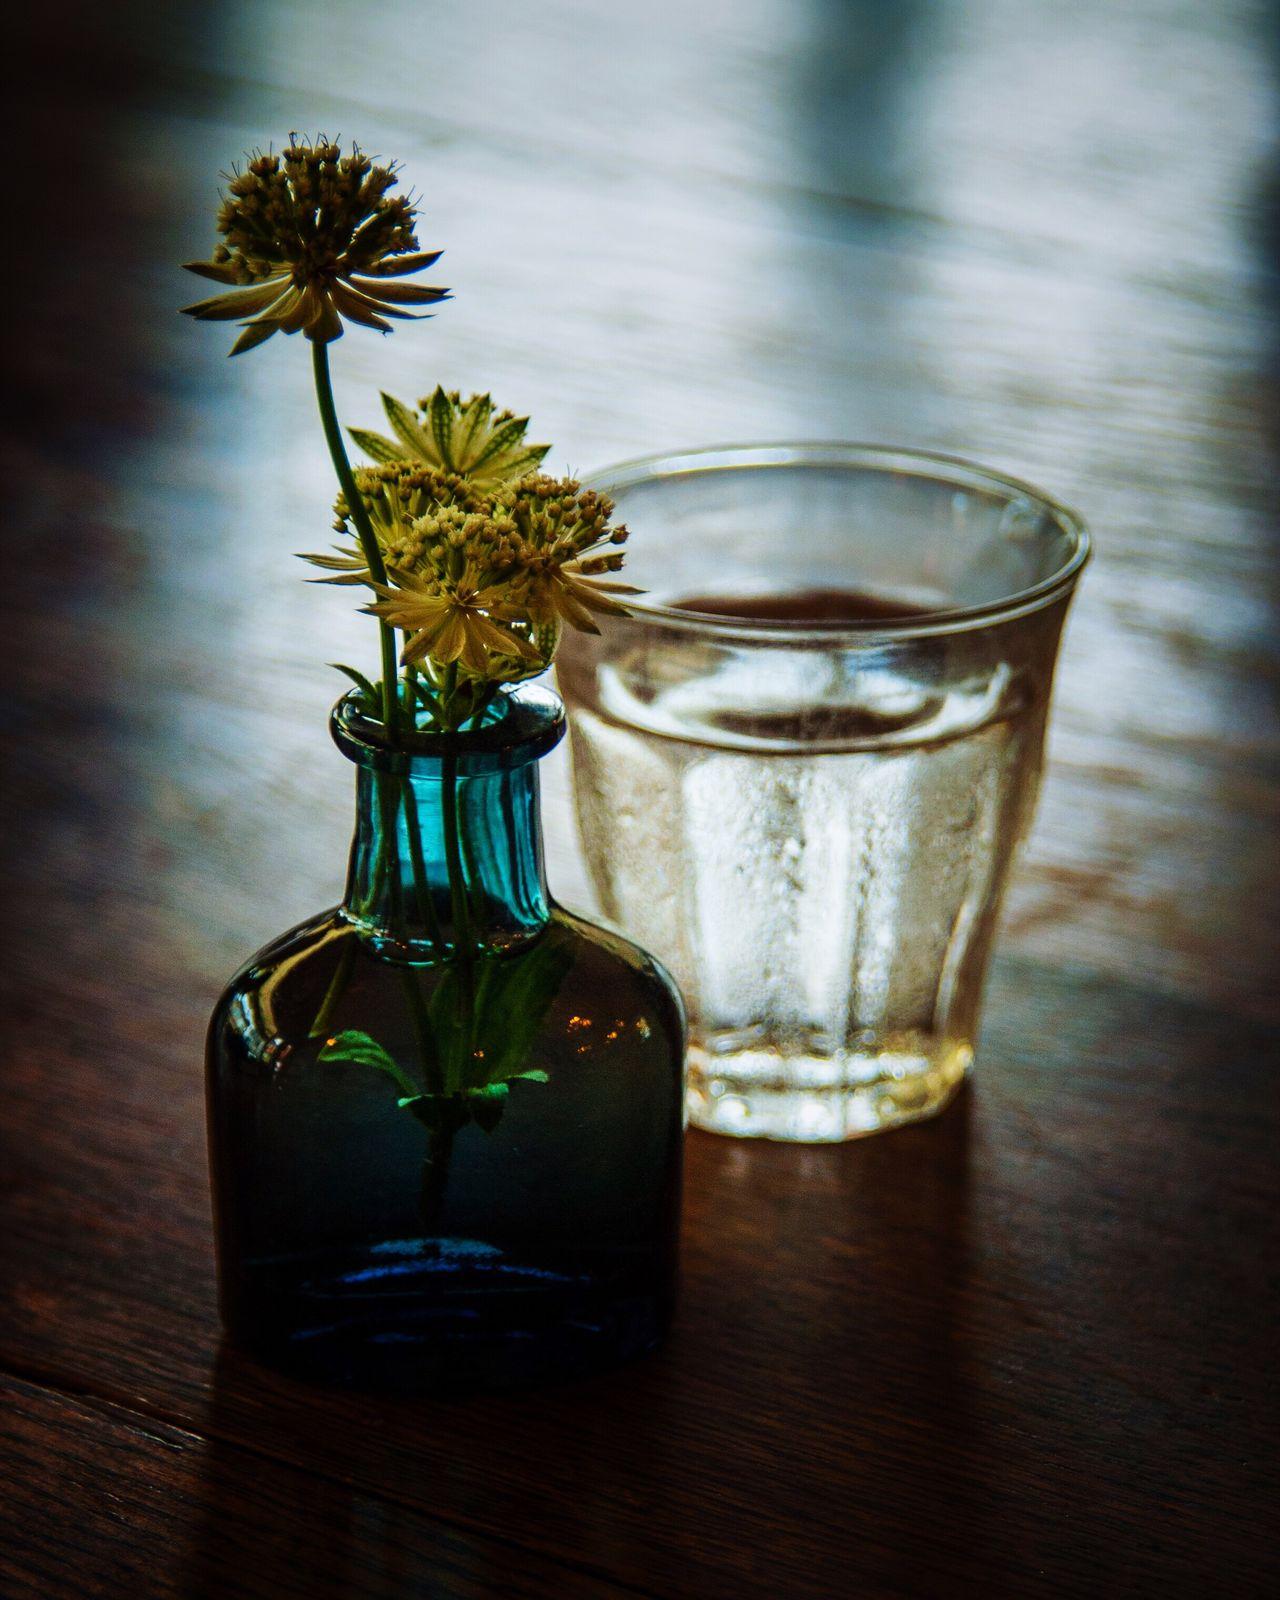 Flower Vase Table Bottle Drinking Glass Drink Water Flower Head Glass Of Water Glass